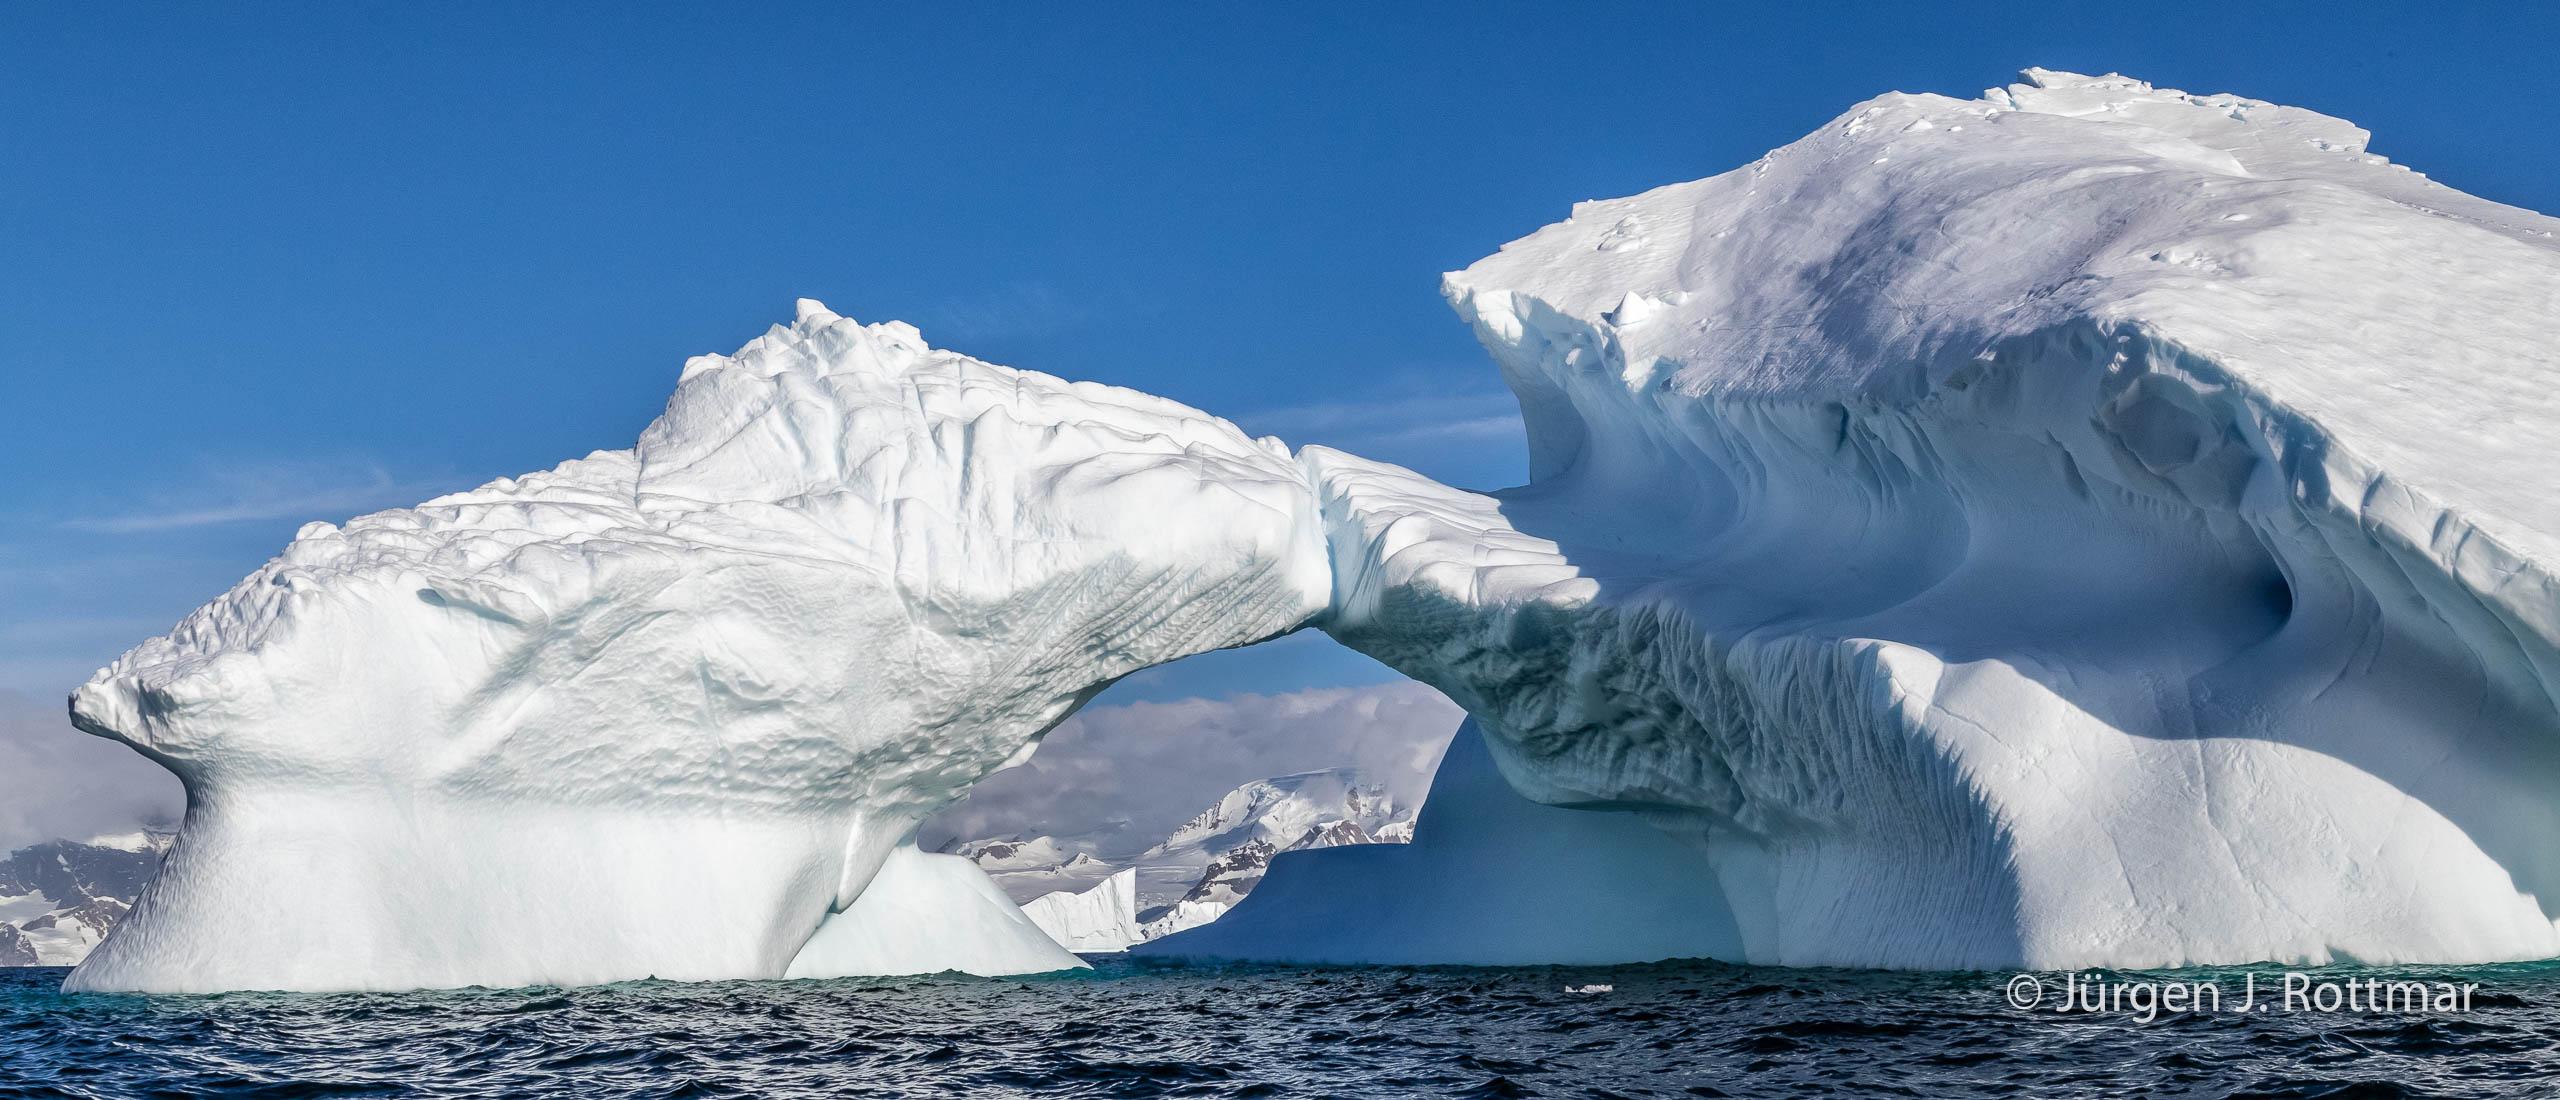 Juergen J Rottmar Antarctic Peninsula M2I1364 Bearbeitet